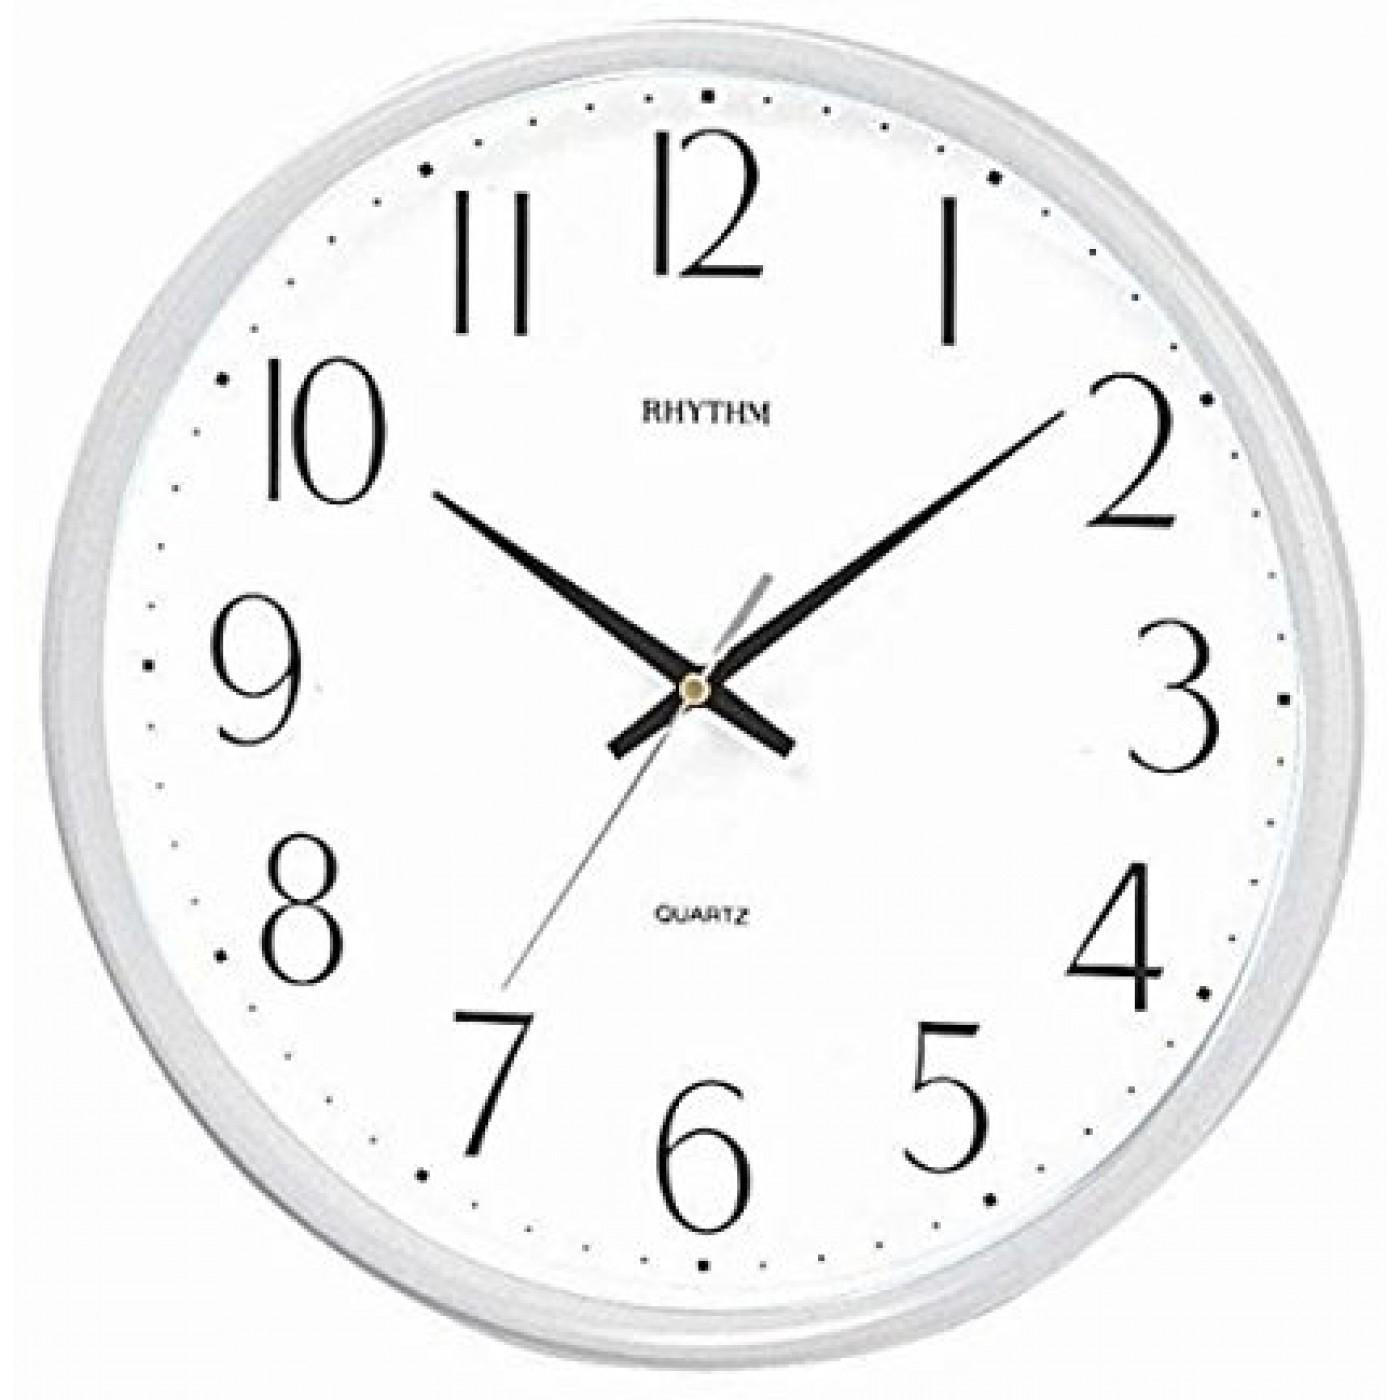 Rhythm Quartz Analog Wall Clock CMG817NR03